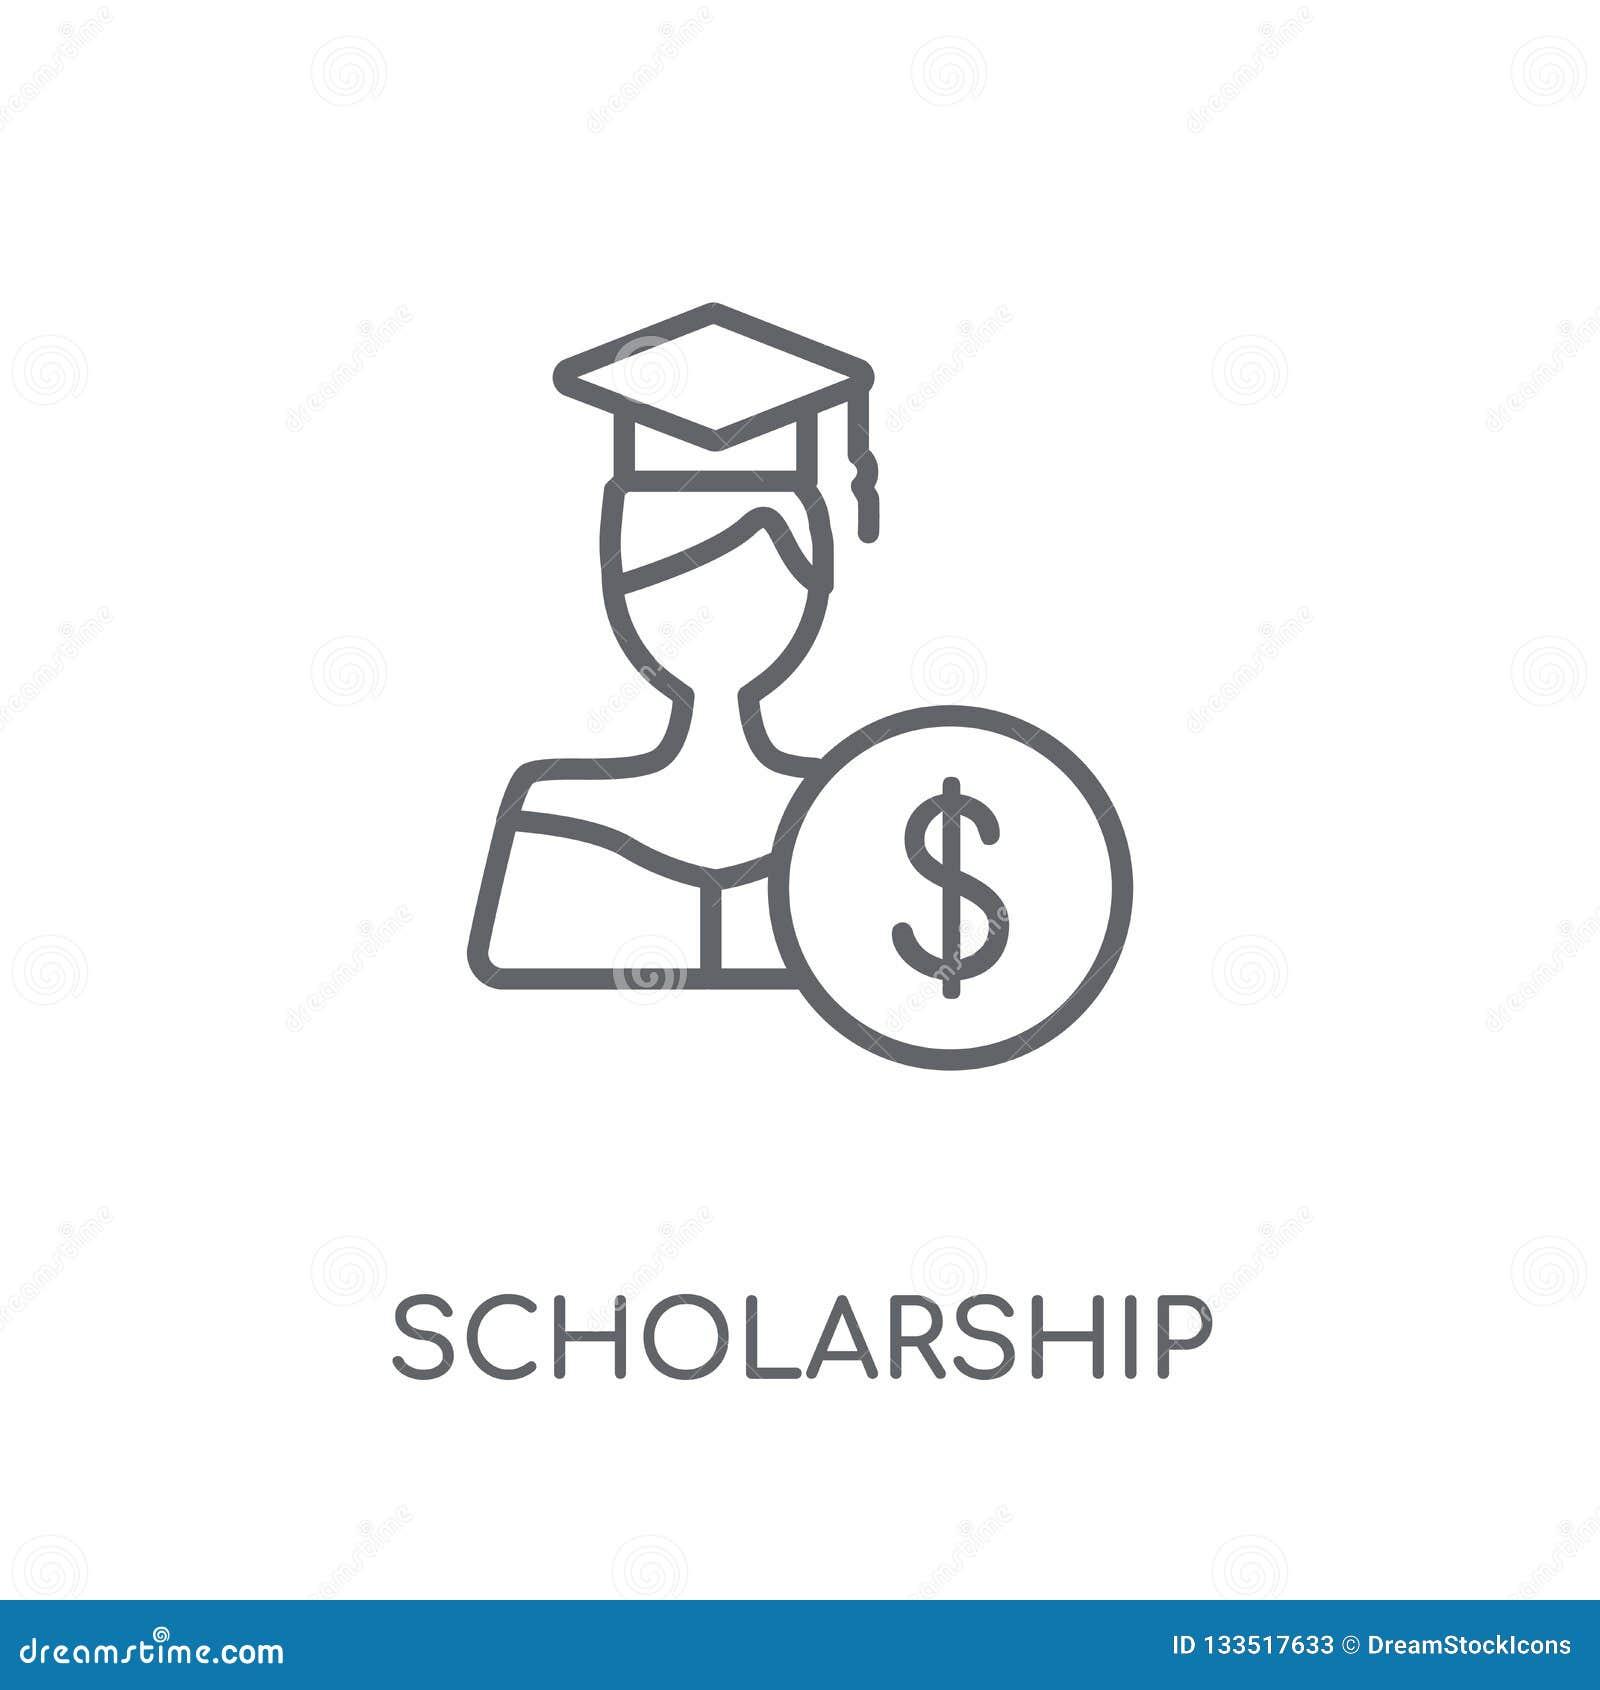 Scholarship Linear Icon. Modern Outline Scholarship Logo ...